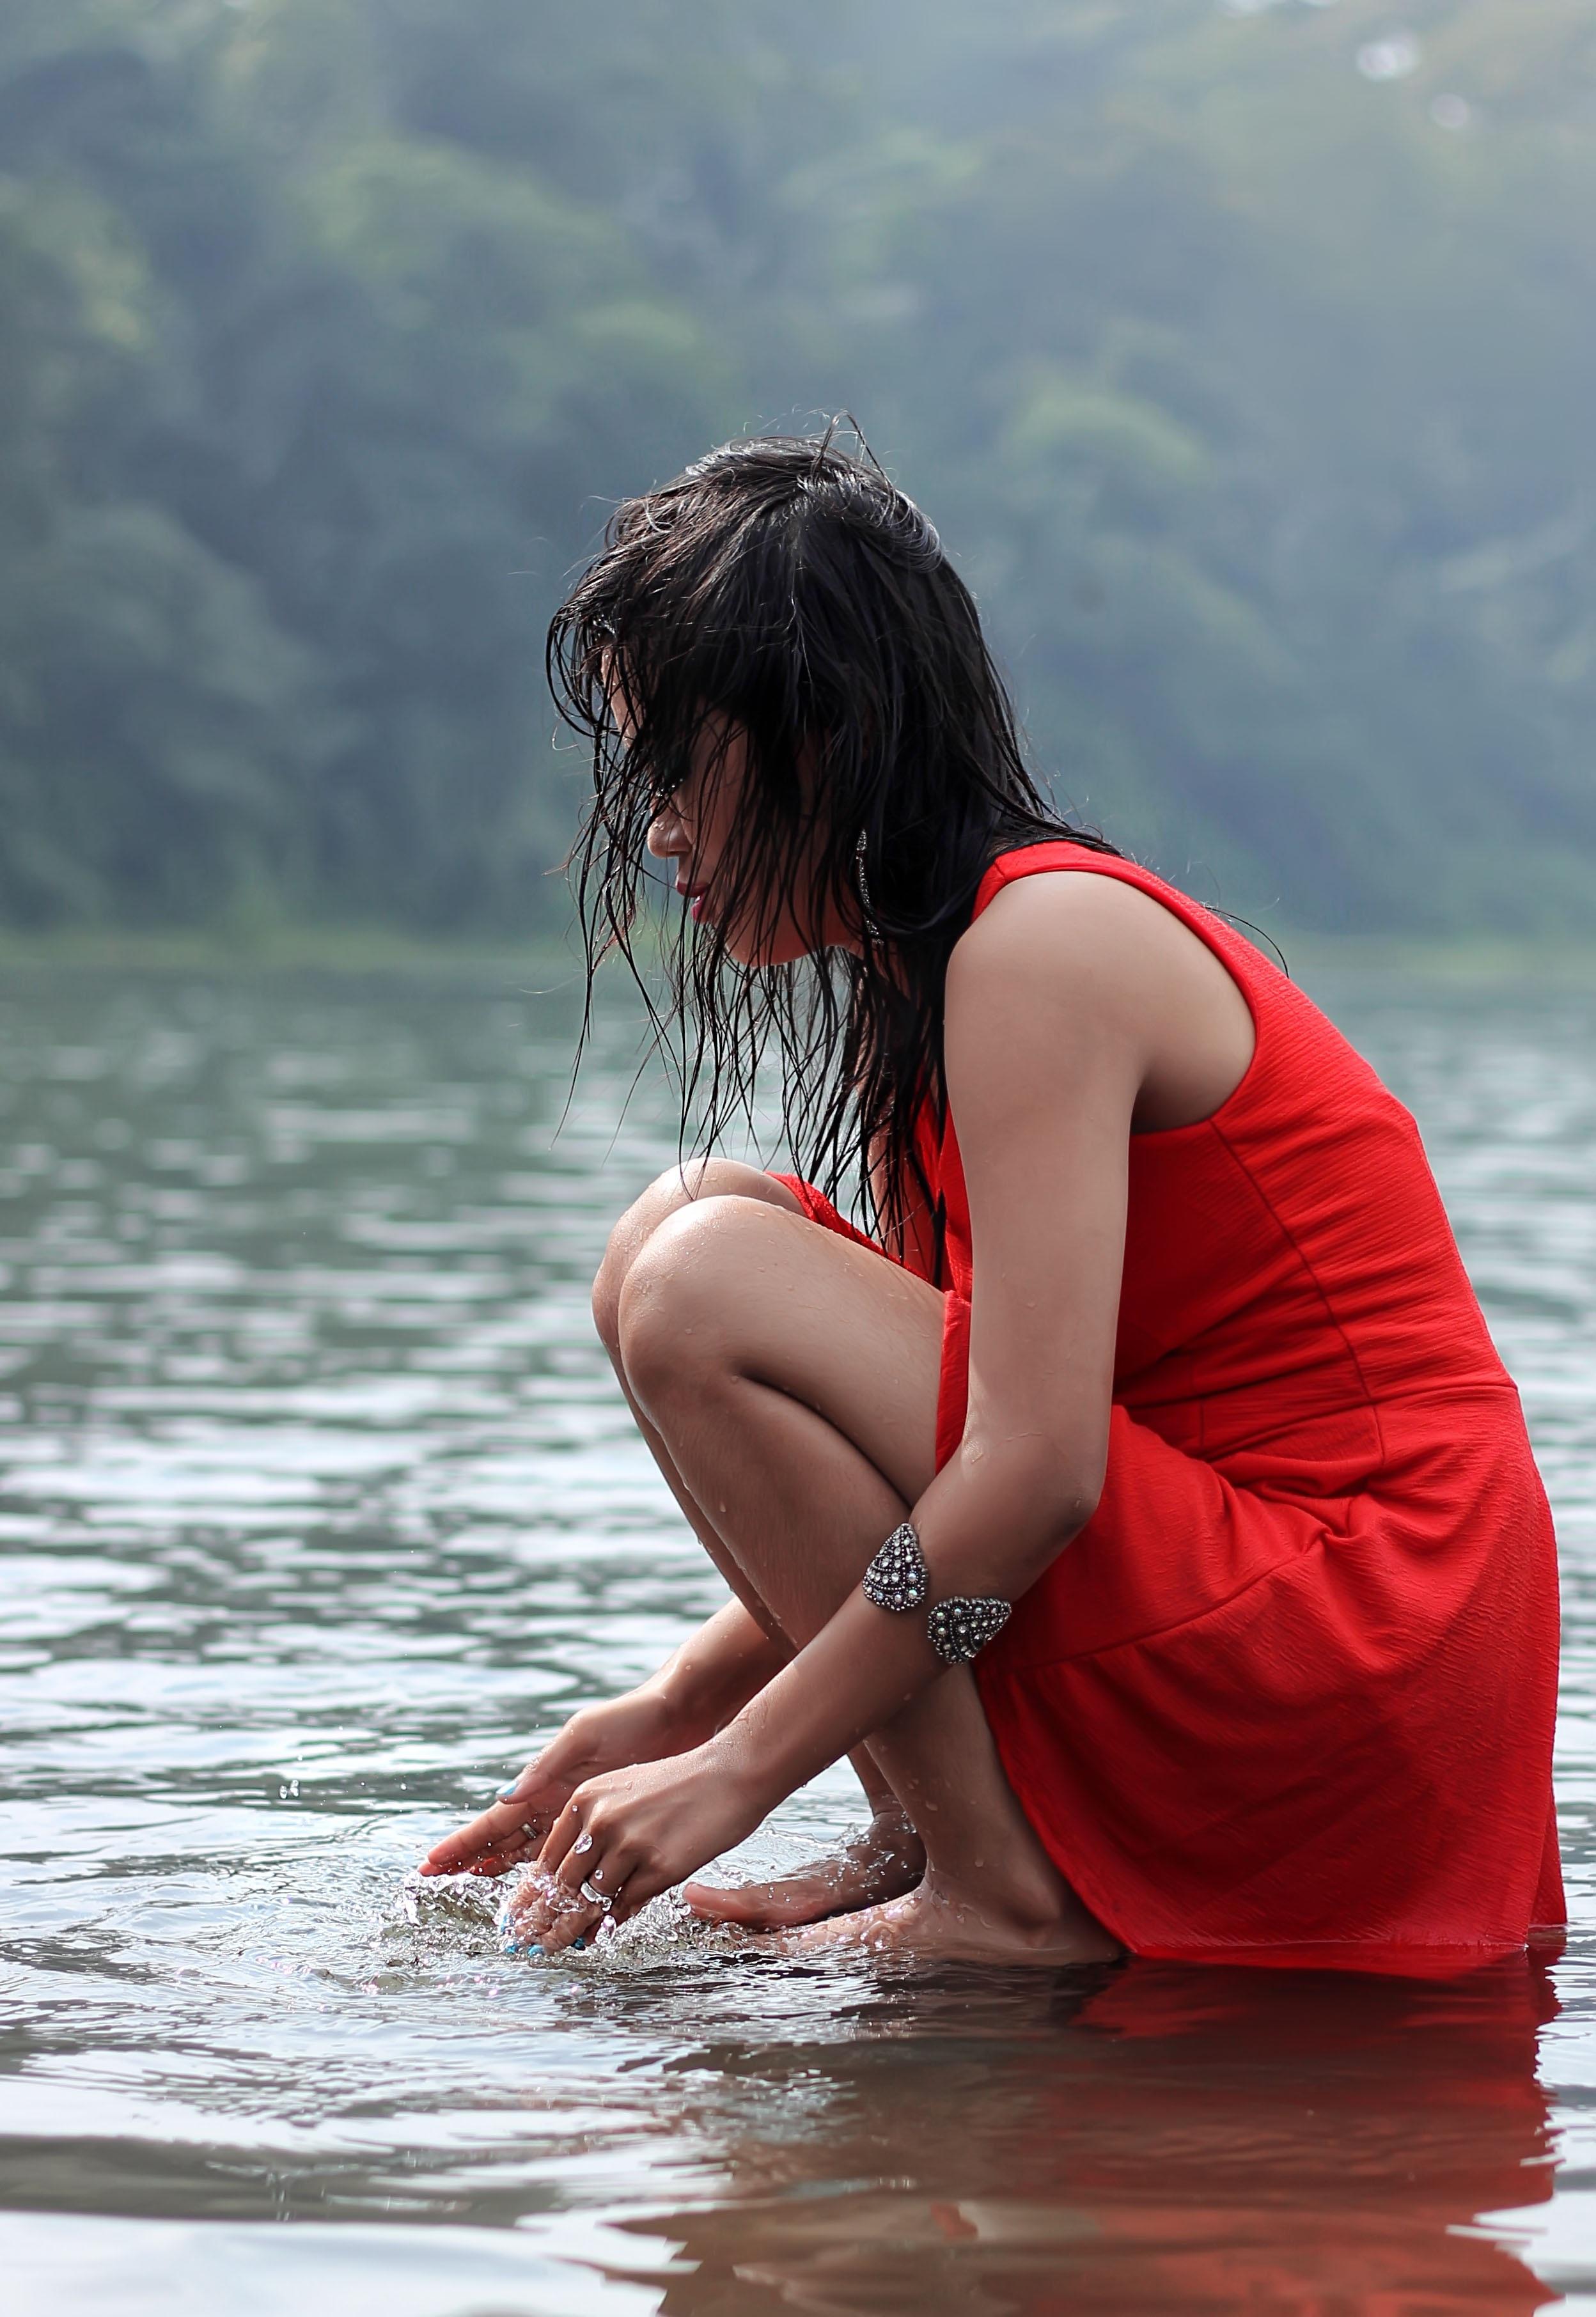 Free Images  Sea, Water, Person, Girl, Woman, Hair, Lake -7588